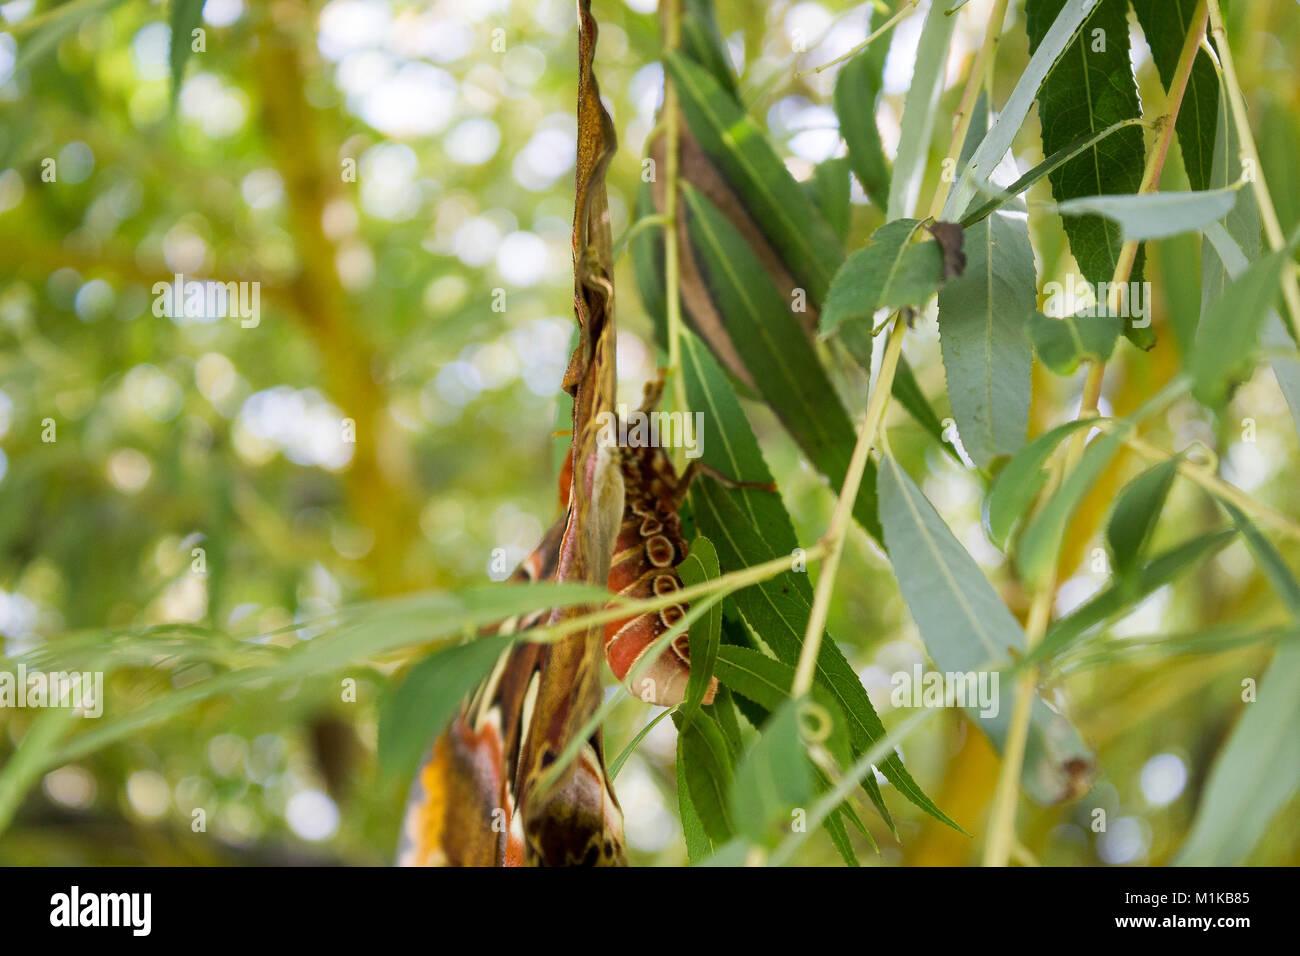 Adult Atlas Moth, Attacus atlas, wings open - Stock Image